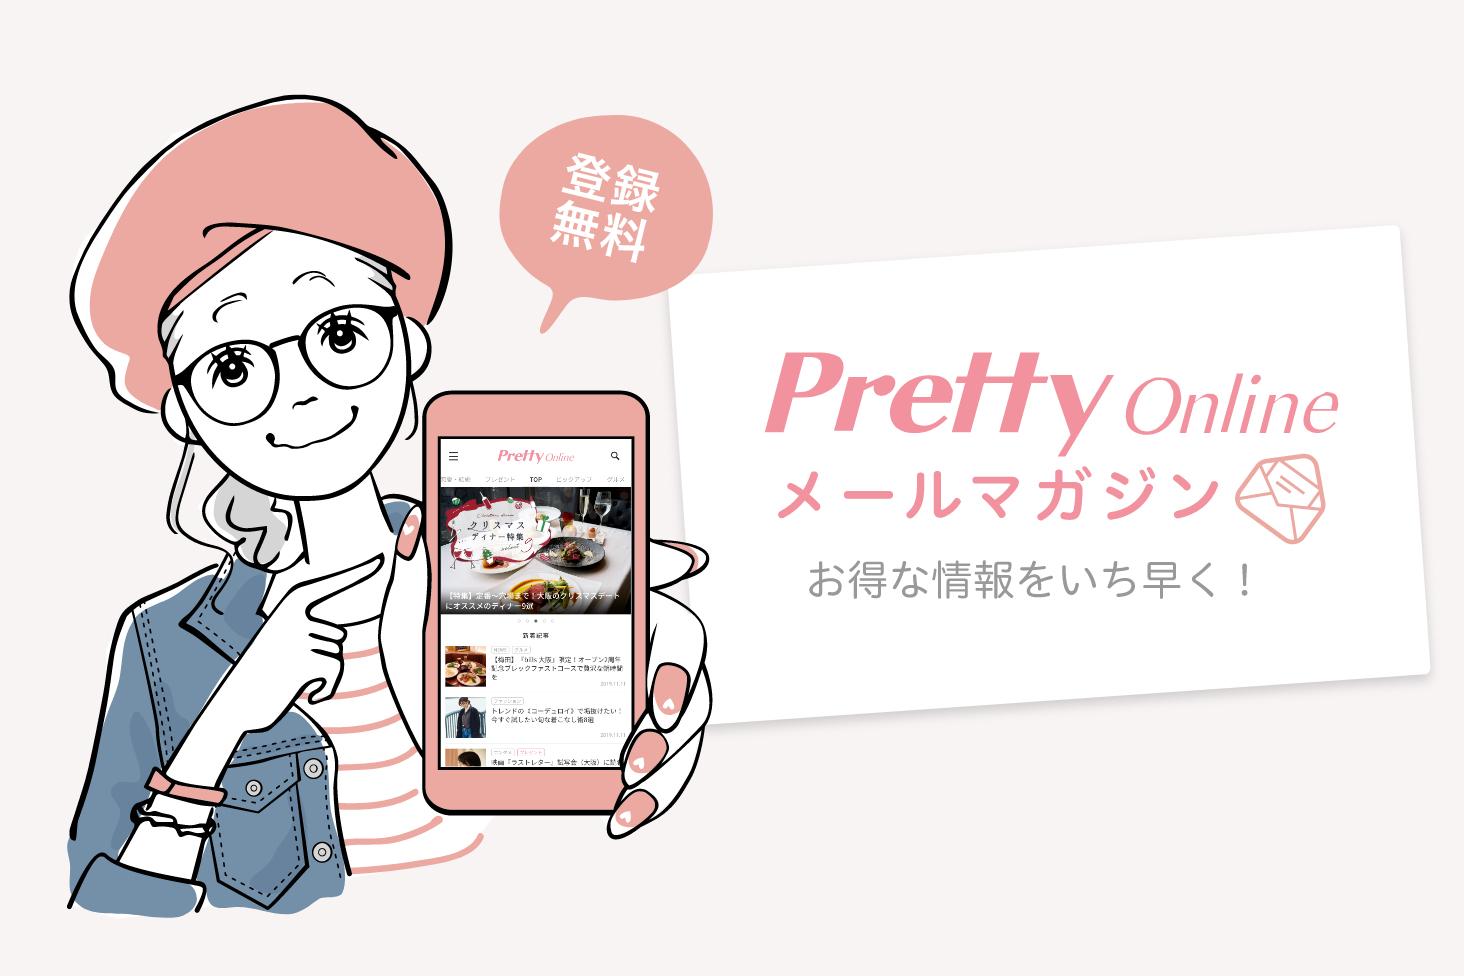 PrettyOnlineメールマガジン購読